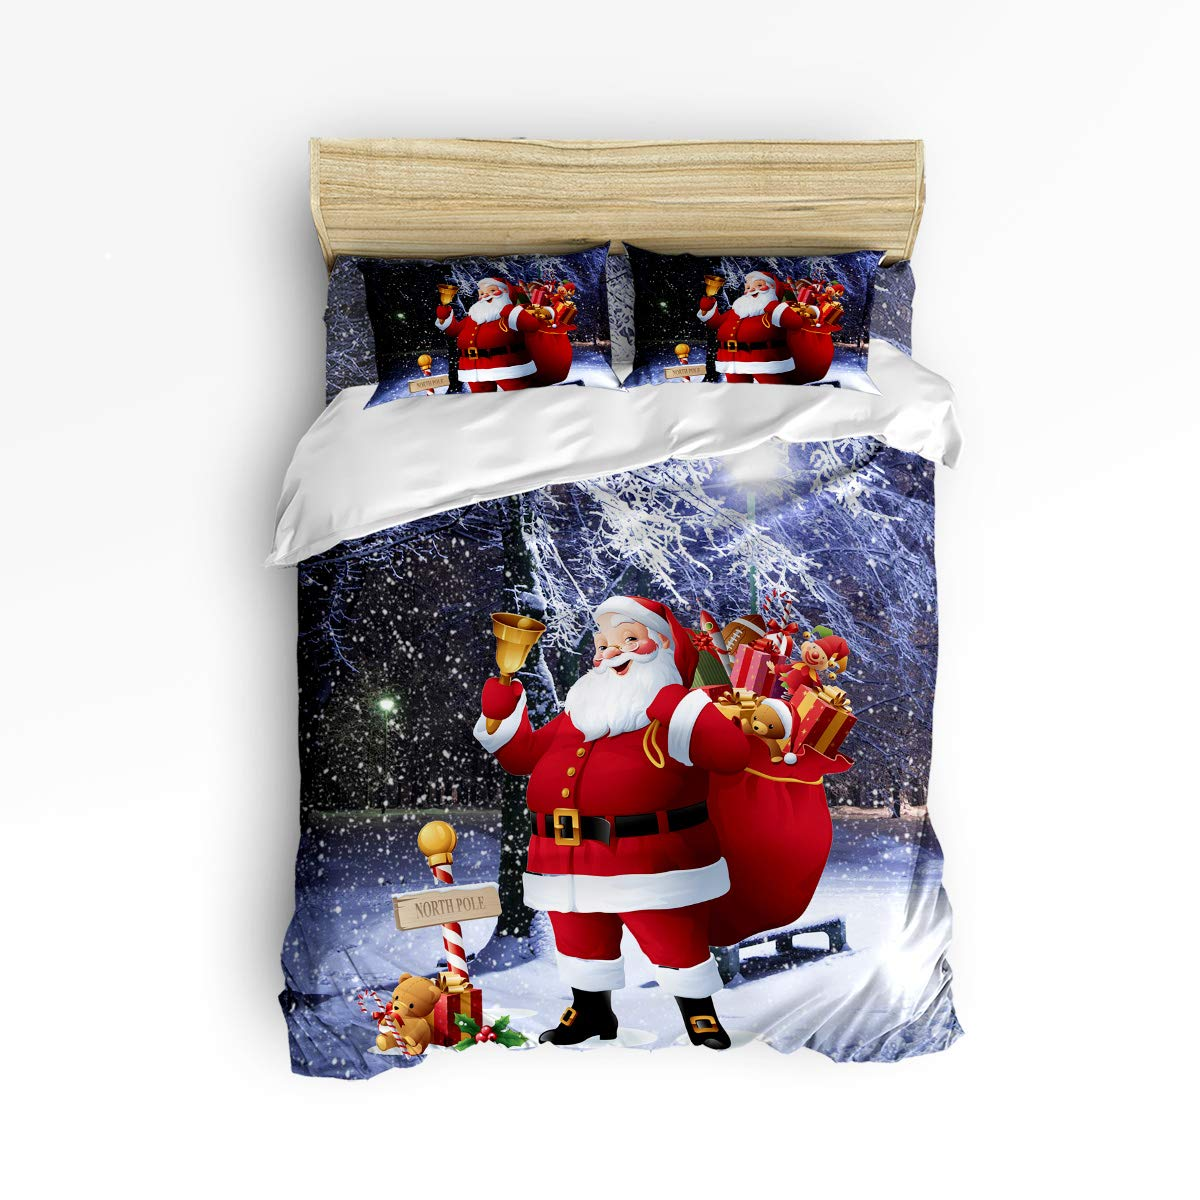 EZON-CH 掛け布団カバーセット 快適な寝具セット カラフルなライオンの頭 動物 手描き ソフトベッドセット 大人 十代 子供 女の子 男の子用 羽毛布団カバー1枚 ベッドシーツ1枚 枕カバー2枚 Queen Size 181112WHLWHLEZONSJTSLXM01696SJTCEZN B07KFKFB8M Christmas774lezn2593 Queen Size